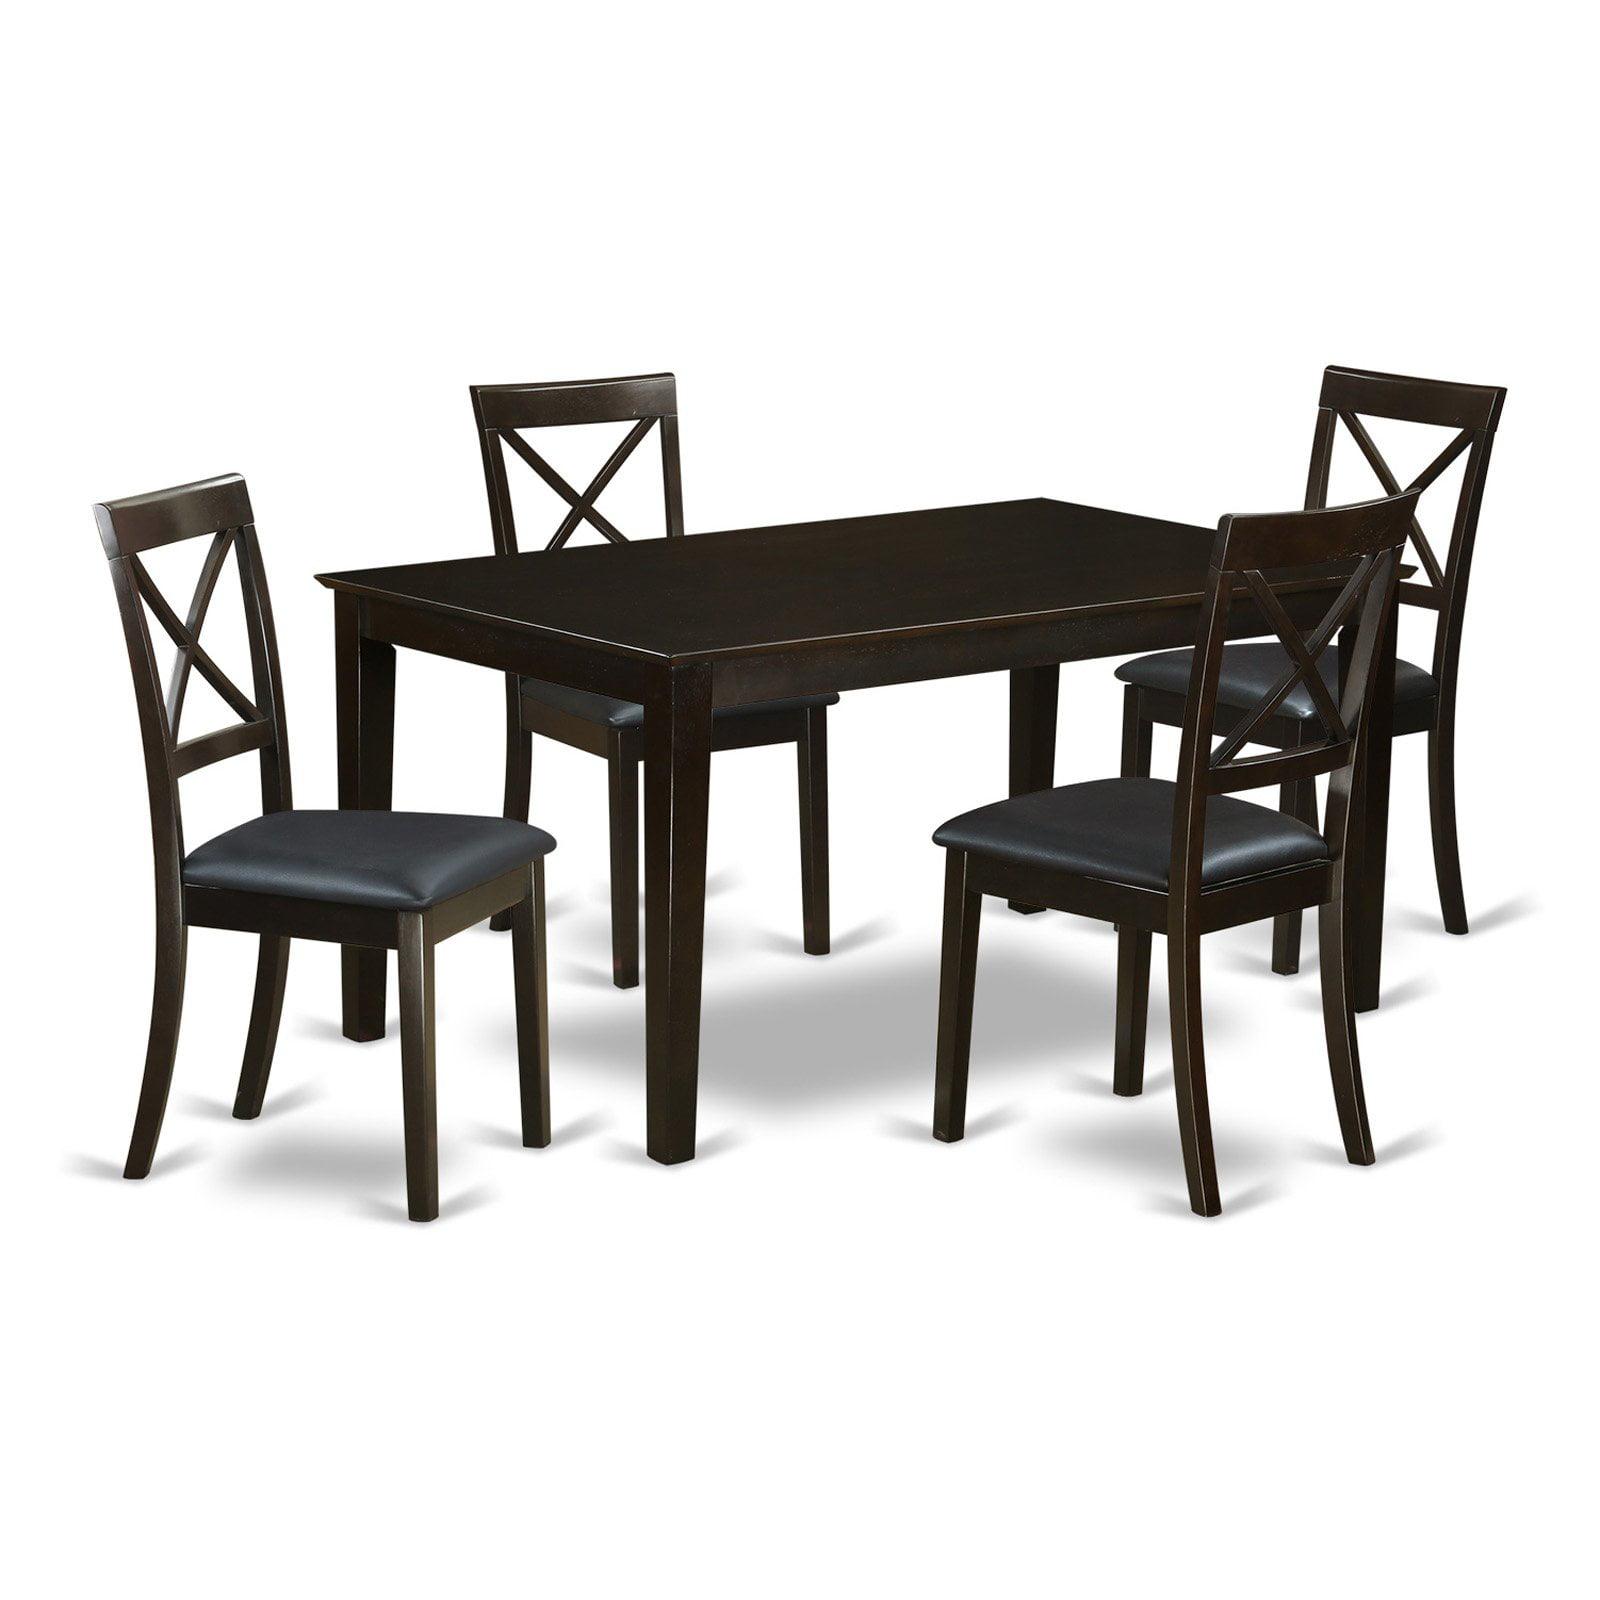 East West Furniture Capri 5 Piece Crossback Dining Table Set